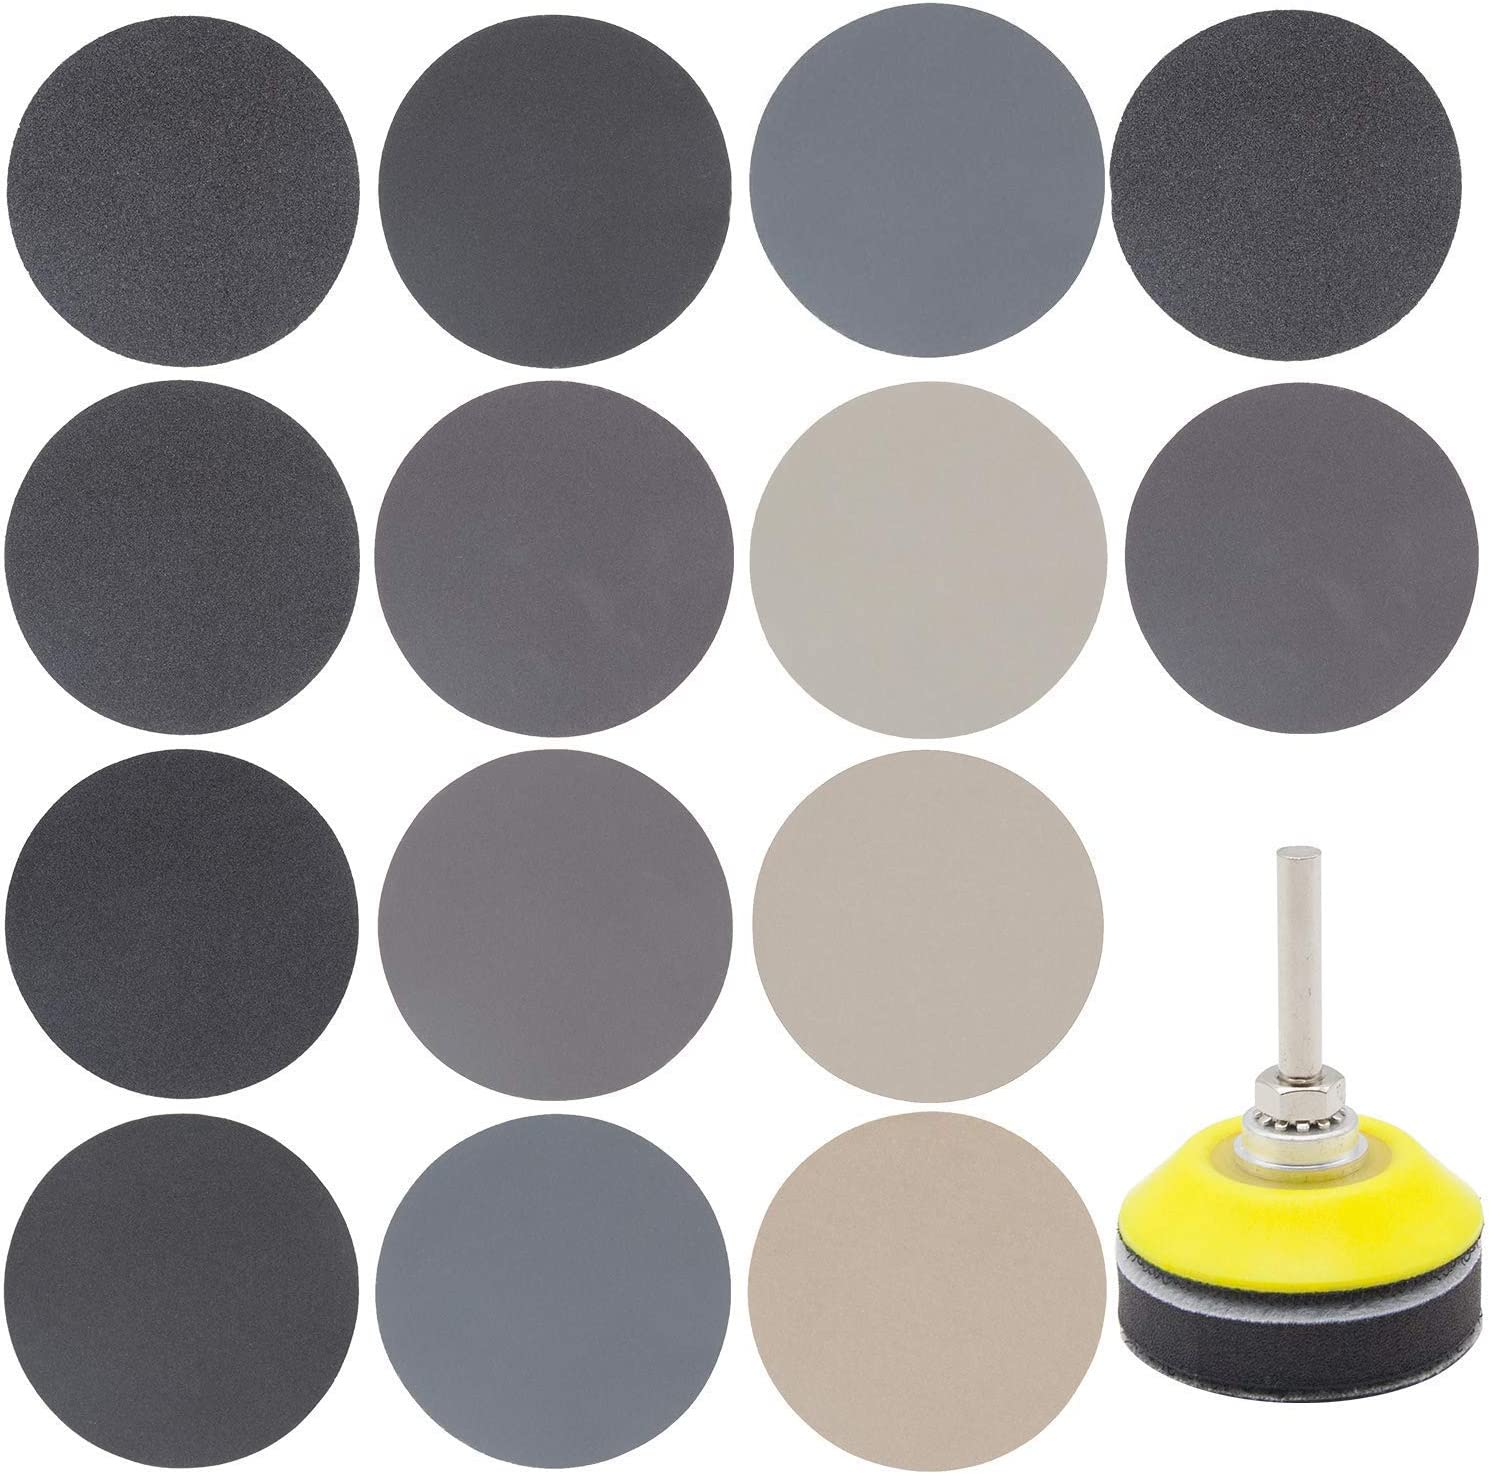 1//4 Inch 240 Grit 100pcs Sanding Grind Polishing Sandpaper Circle Electric Tool